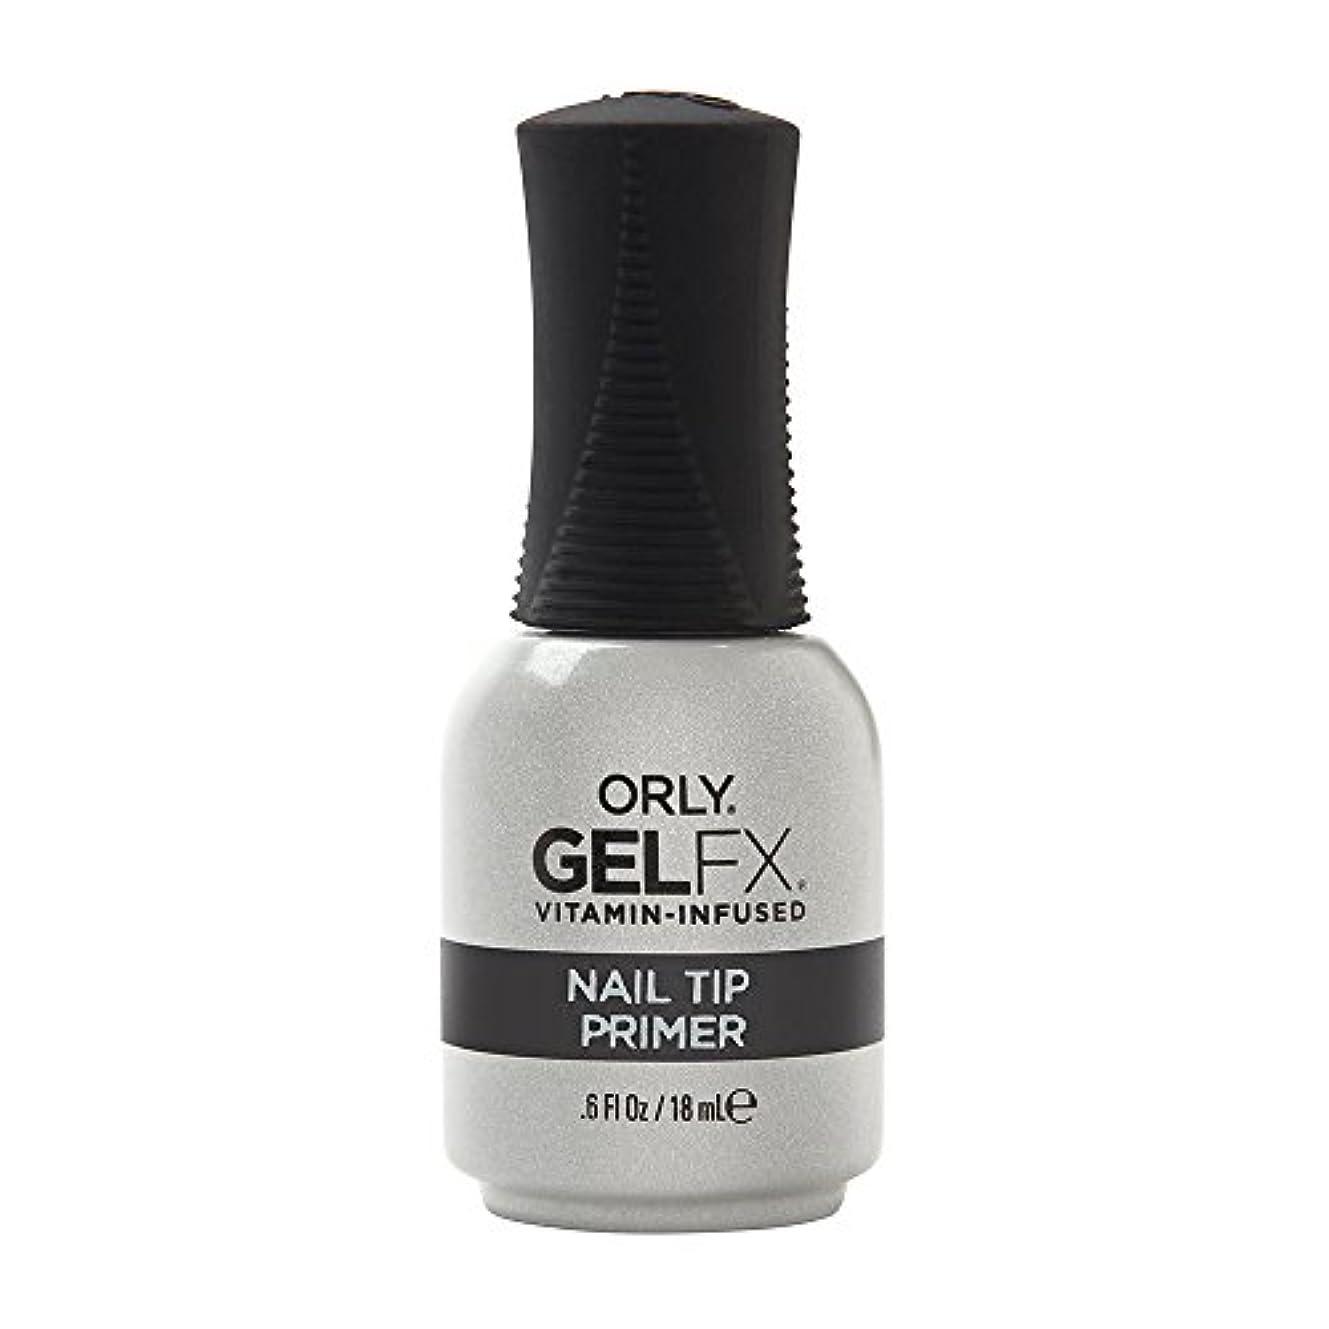 Orly Gel FX - Nail Tip Primer - 0.6 oz / 18 mL